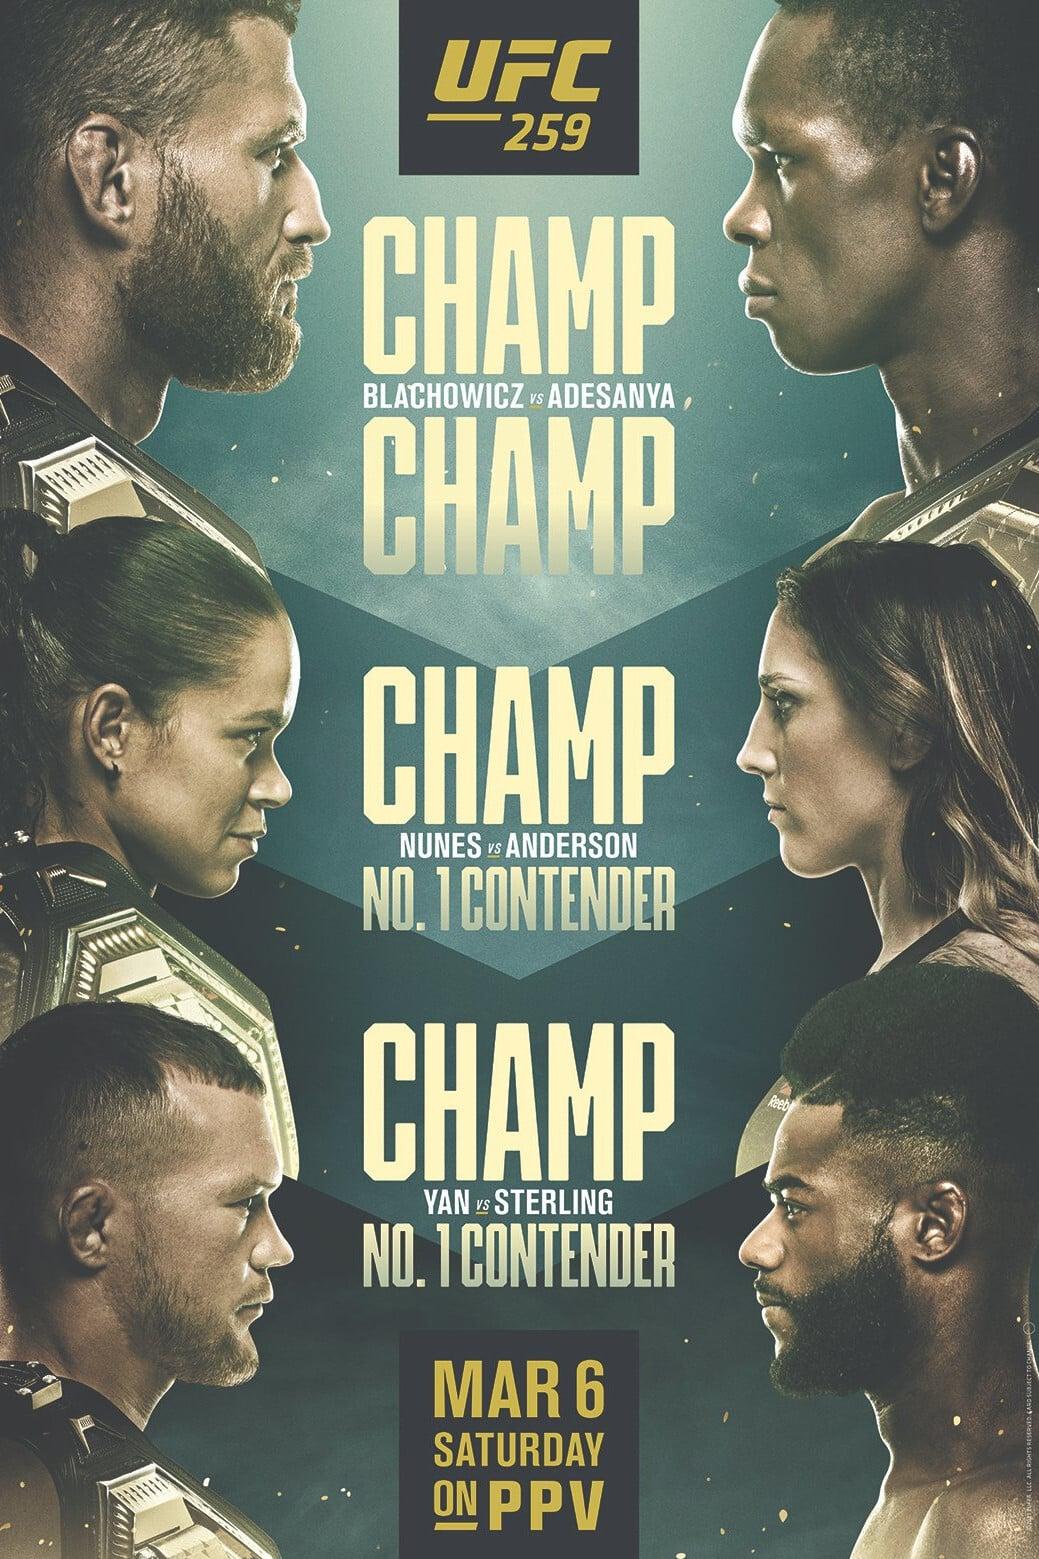 UFC 259: Blachowicz vs. Adesanya